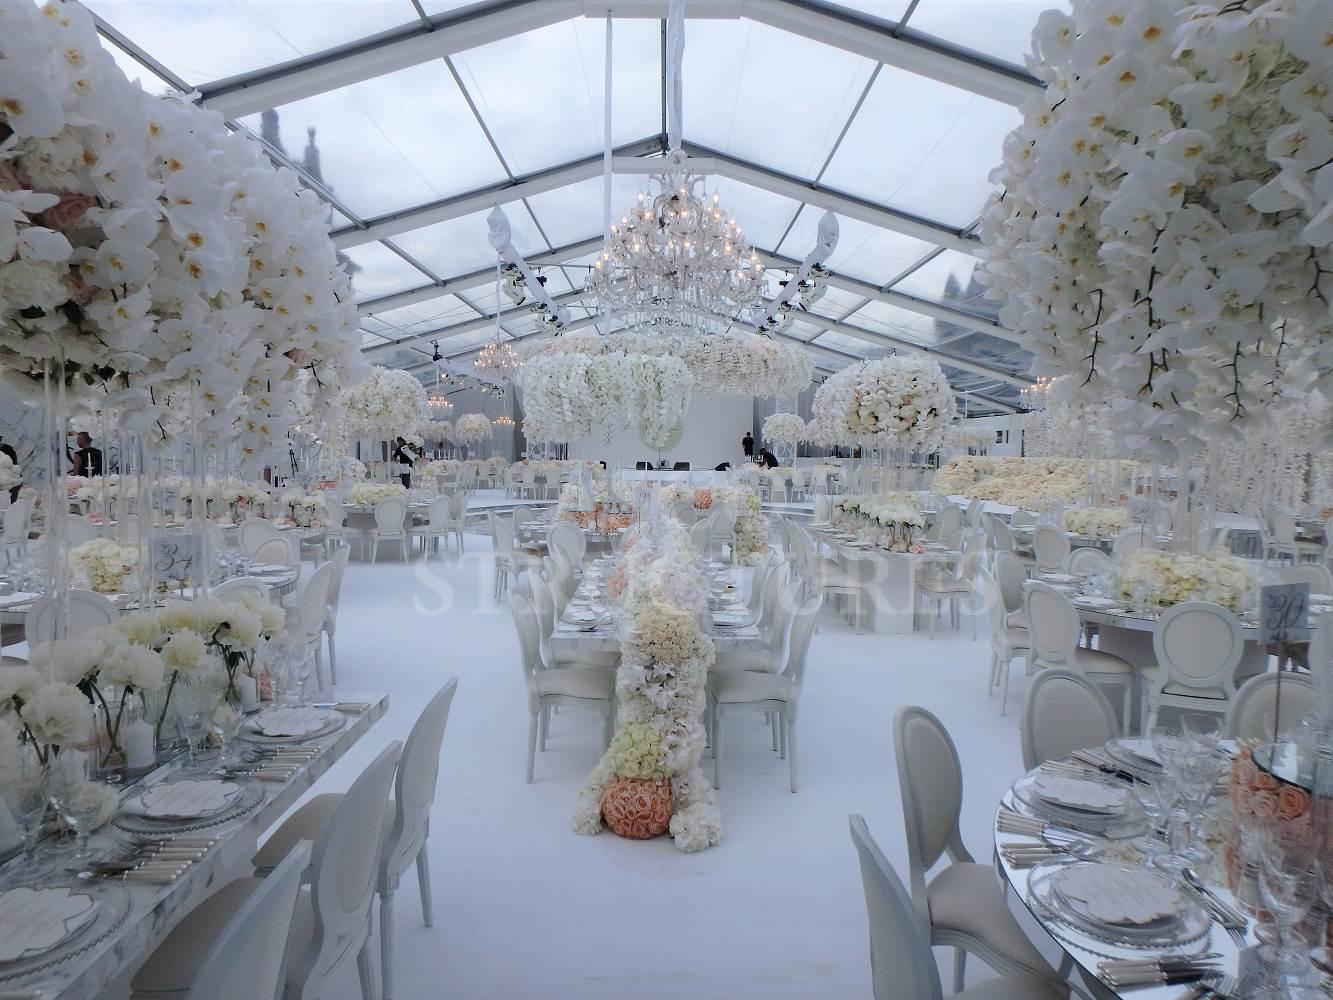 Weddings hhl (1)